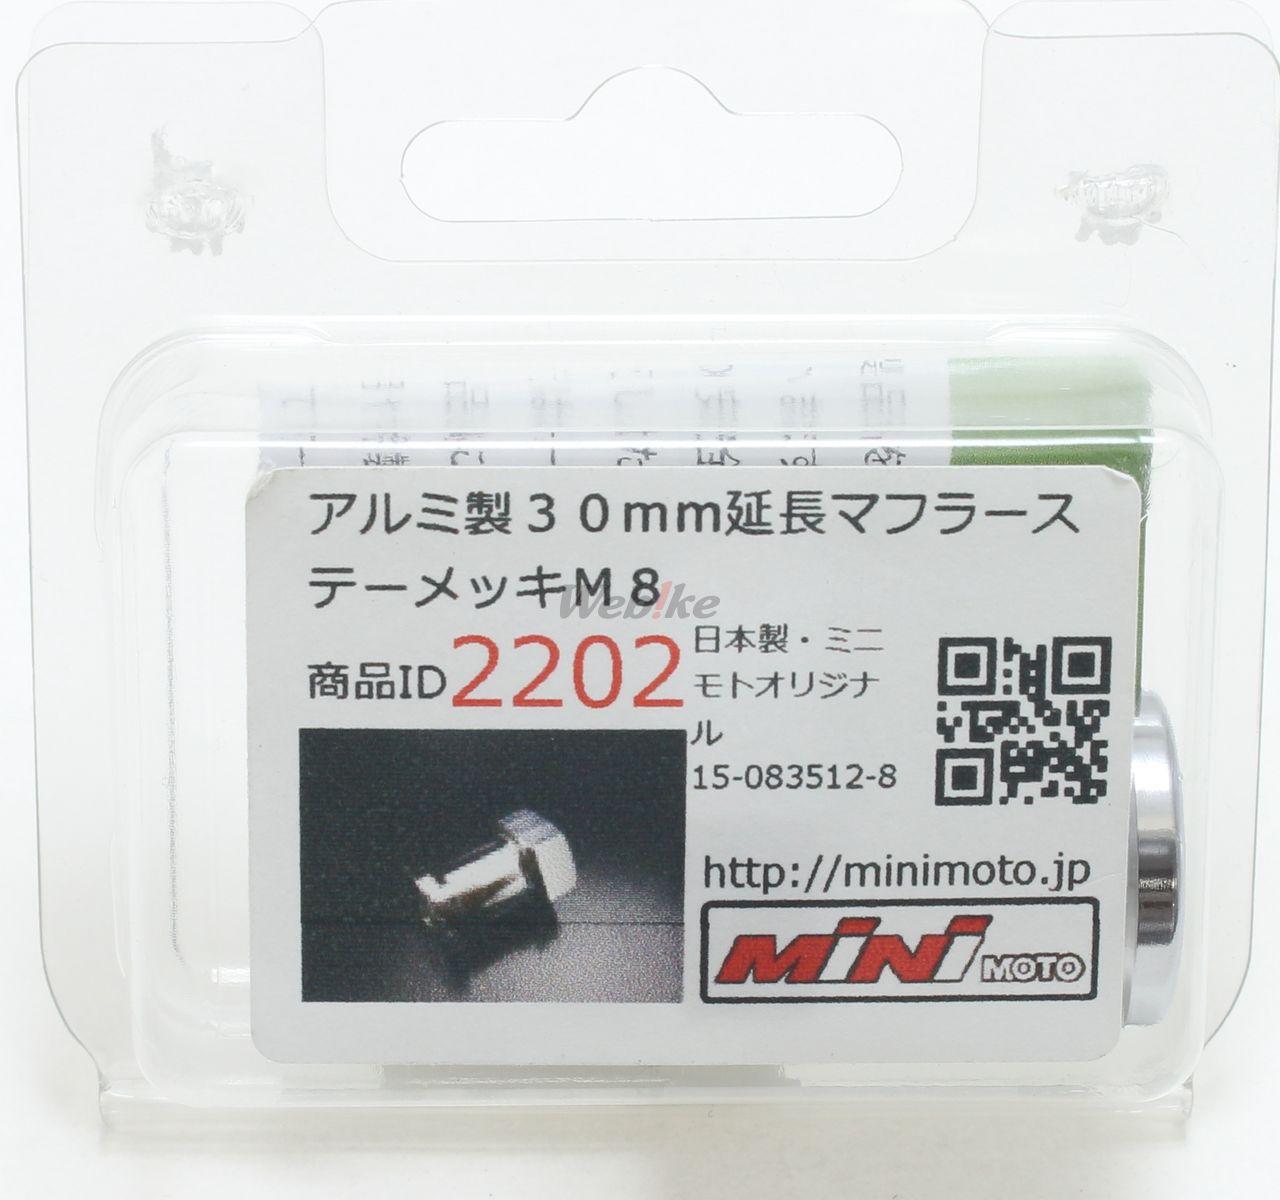 【MINIMOTO】Monkey電鍍製30mm延長排氣管支架 - 「Webike-摩托百貨」